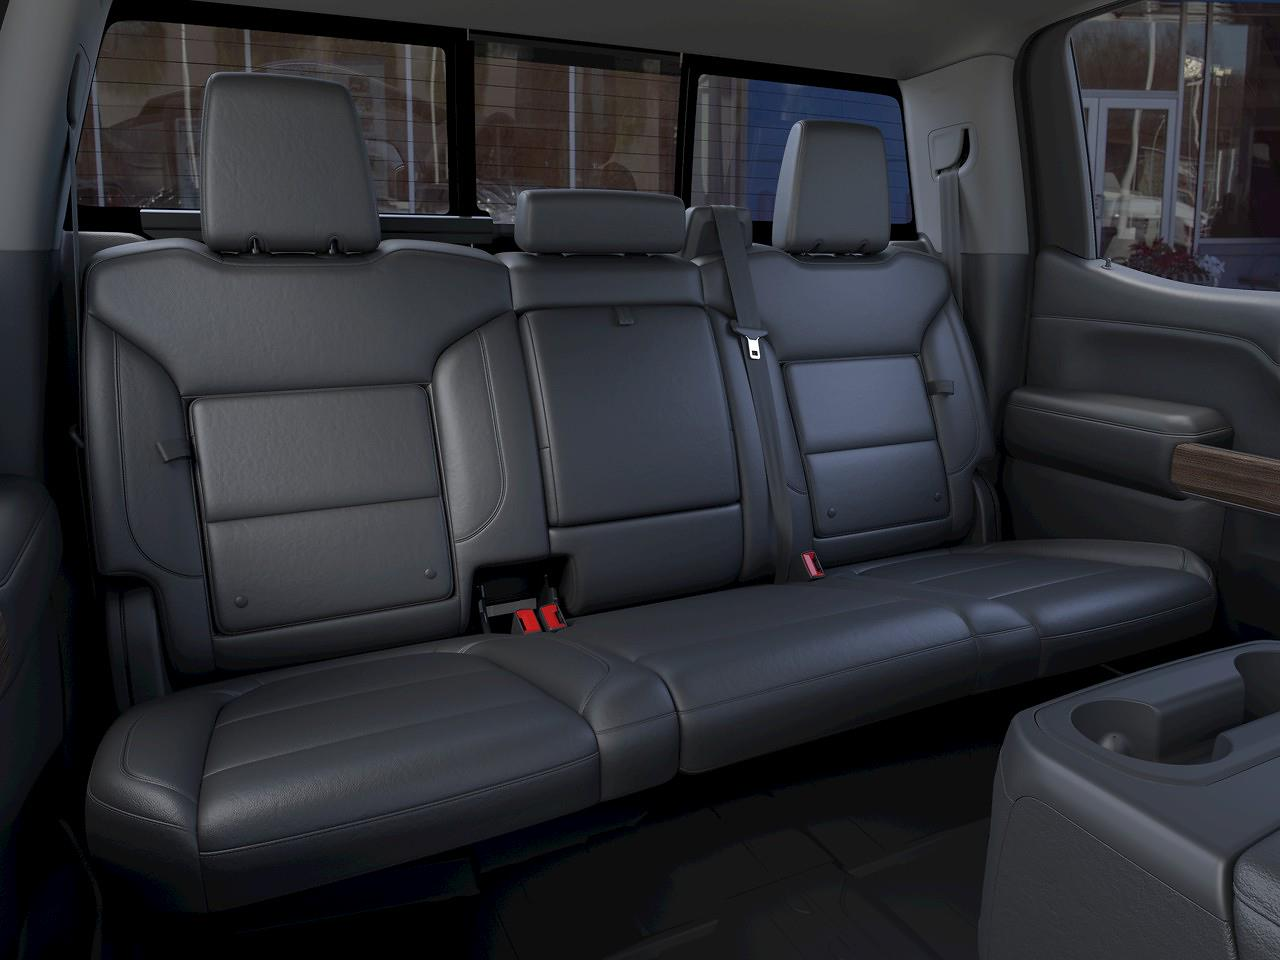 2021 Chevrolet Silverado 1500 Crew Cab 4x4, Pickup #CK1541 - photo 14